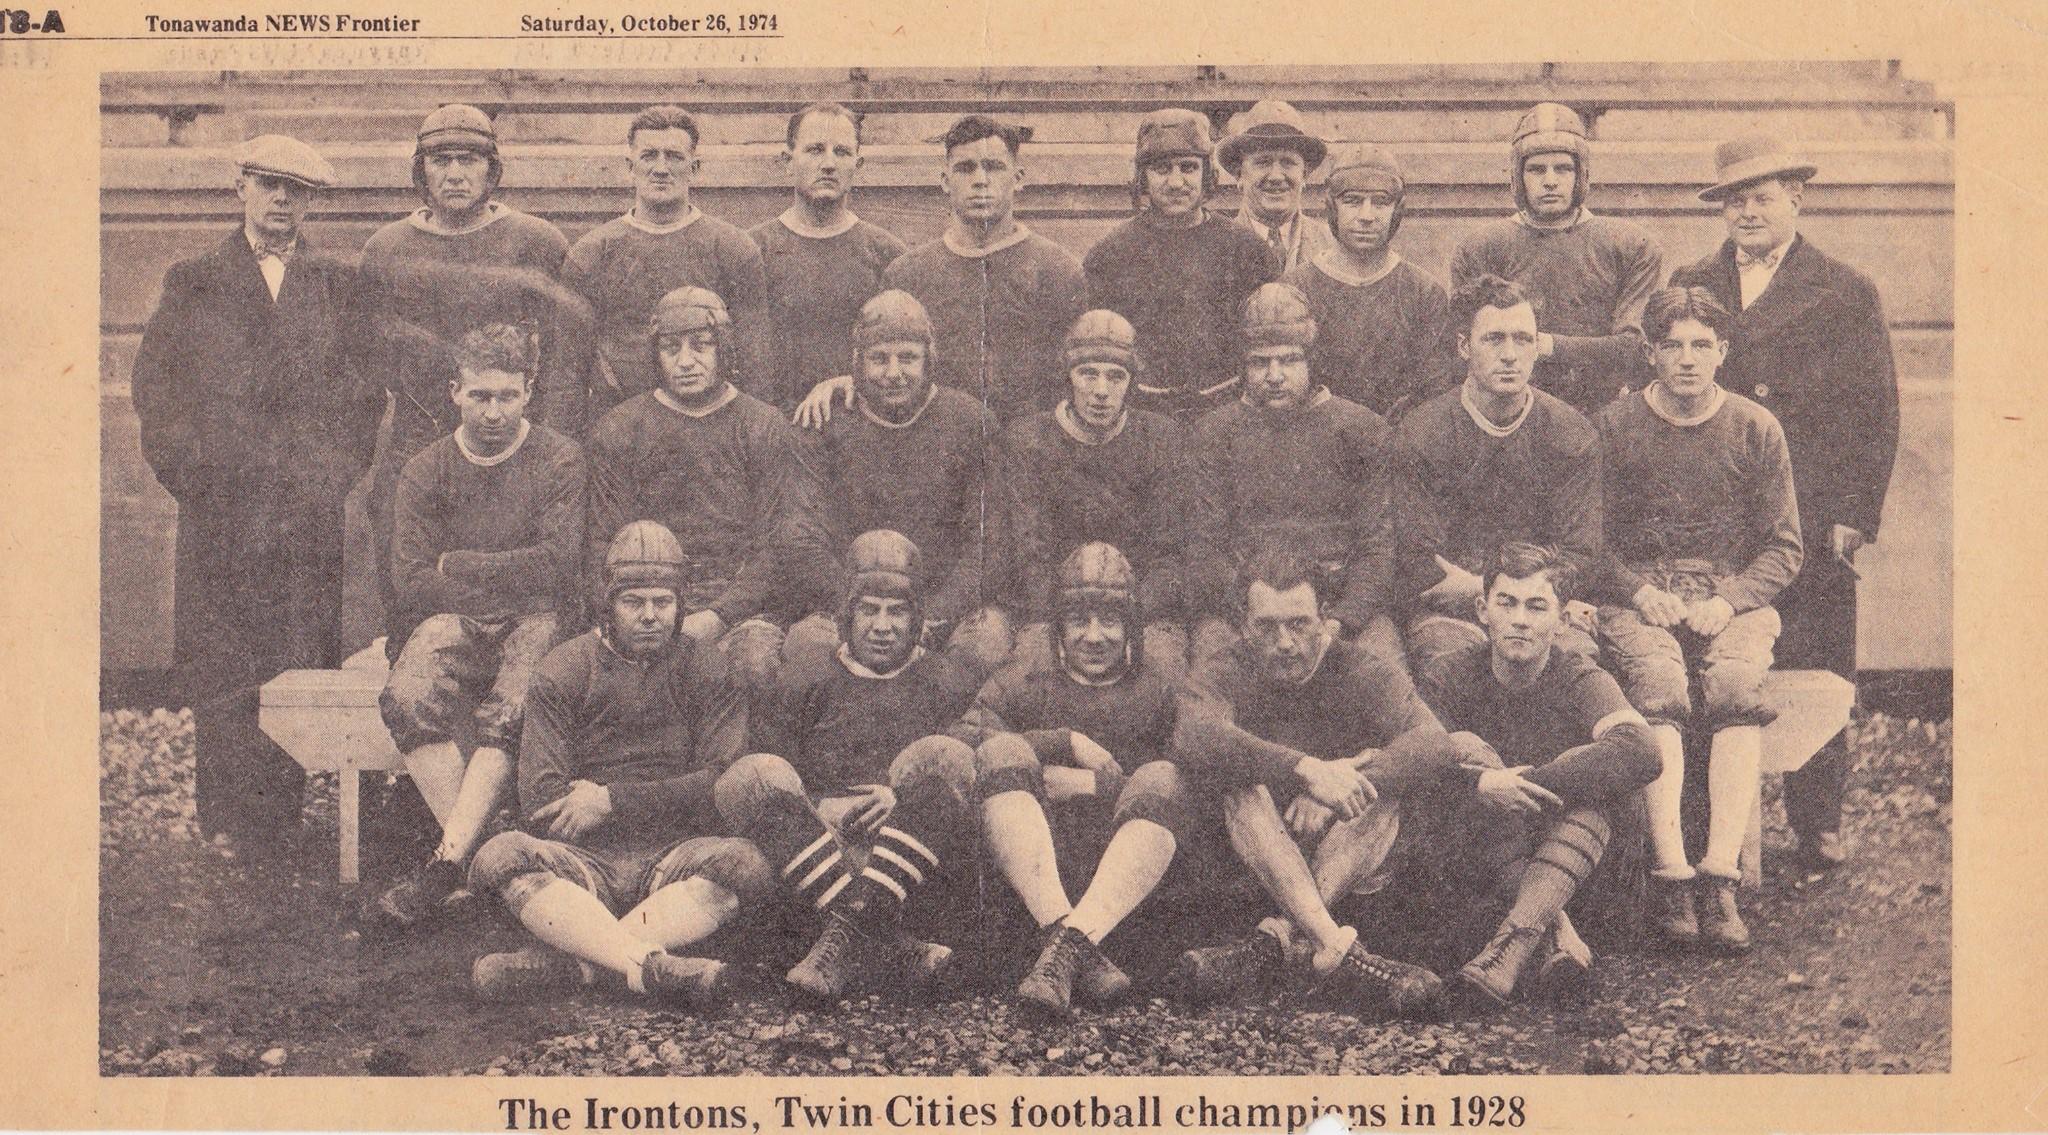 The Irontons, 1928 Twin Cities Champions, newspaper photos (1974, Tonawanda News, Olszowka).jpg